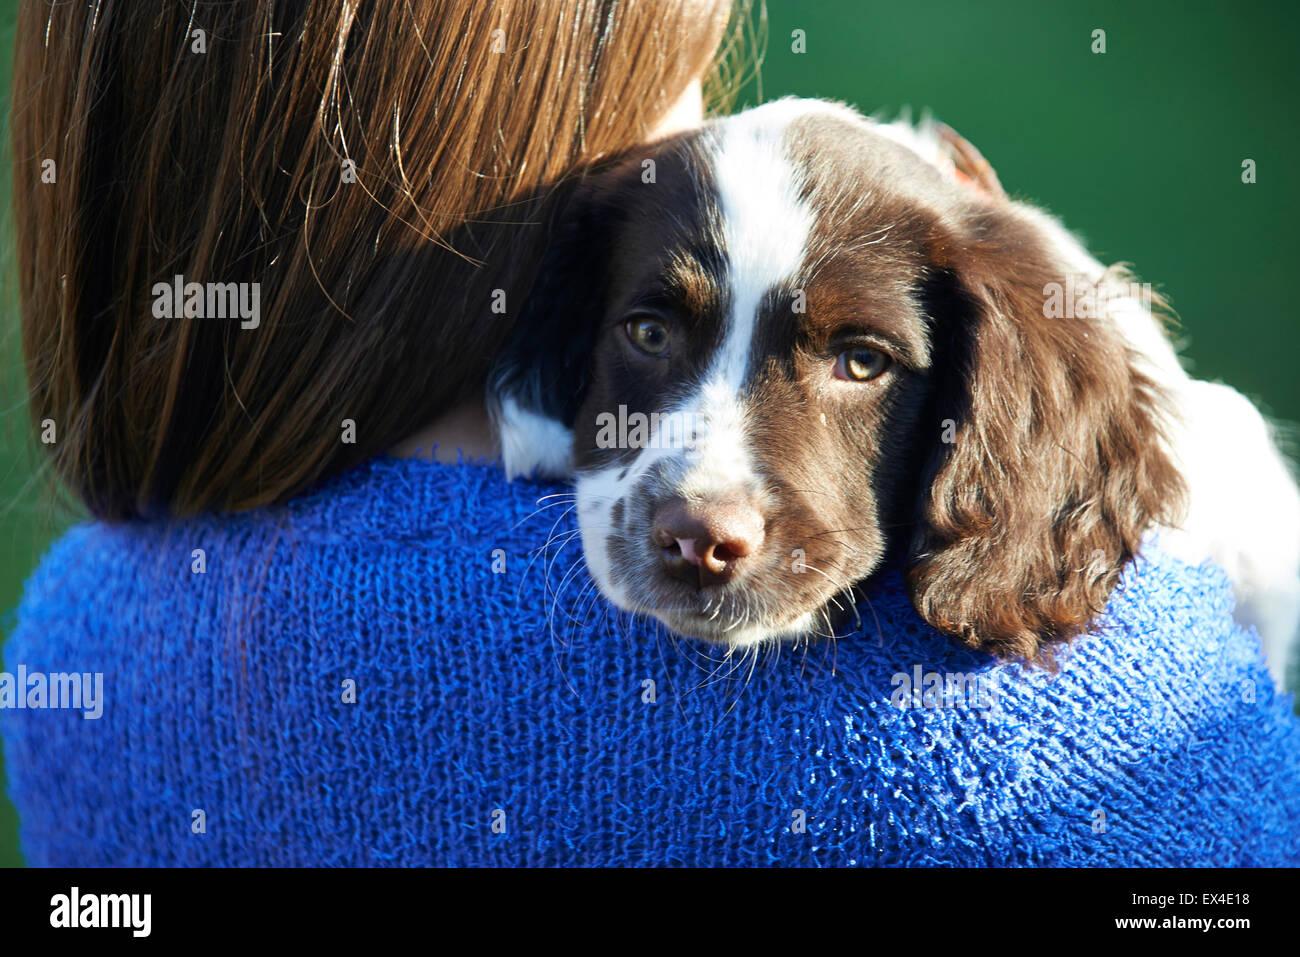 Girl Holding Animal Spaniel Puppy Outdoors In Garden Photo Stock